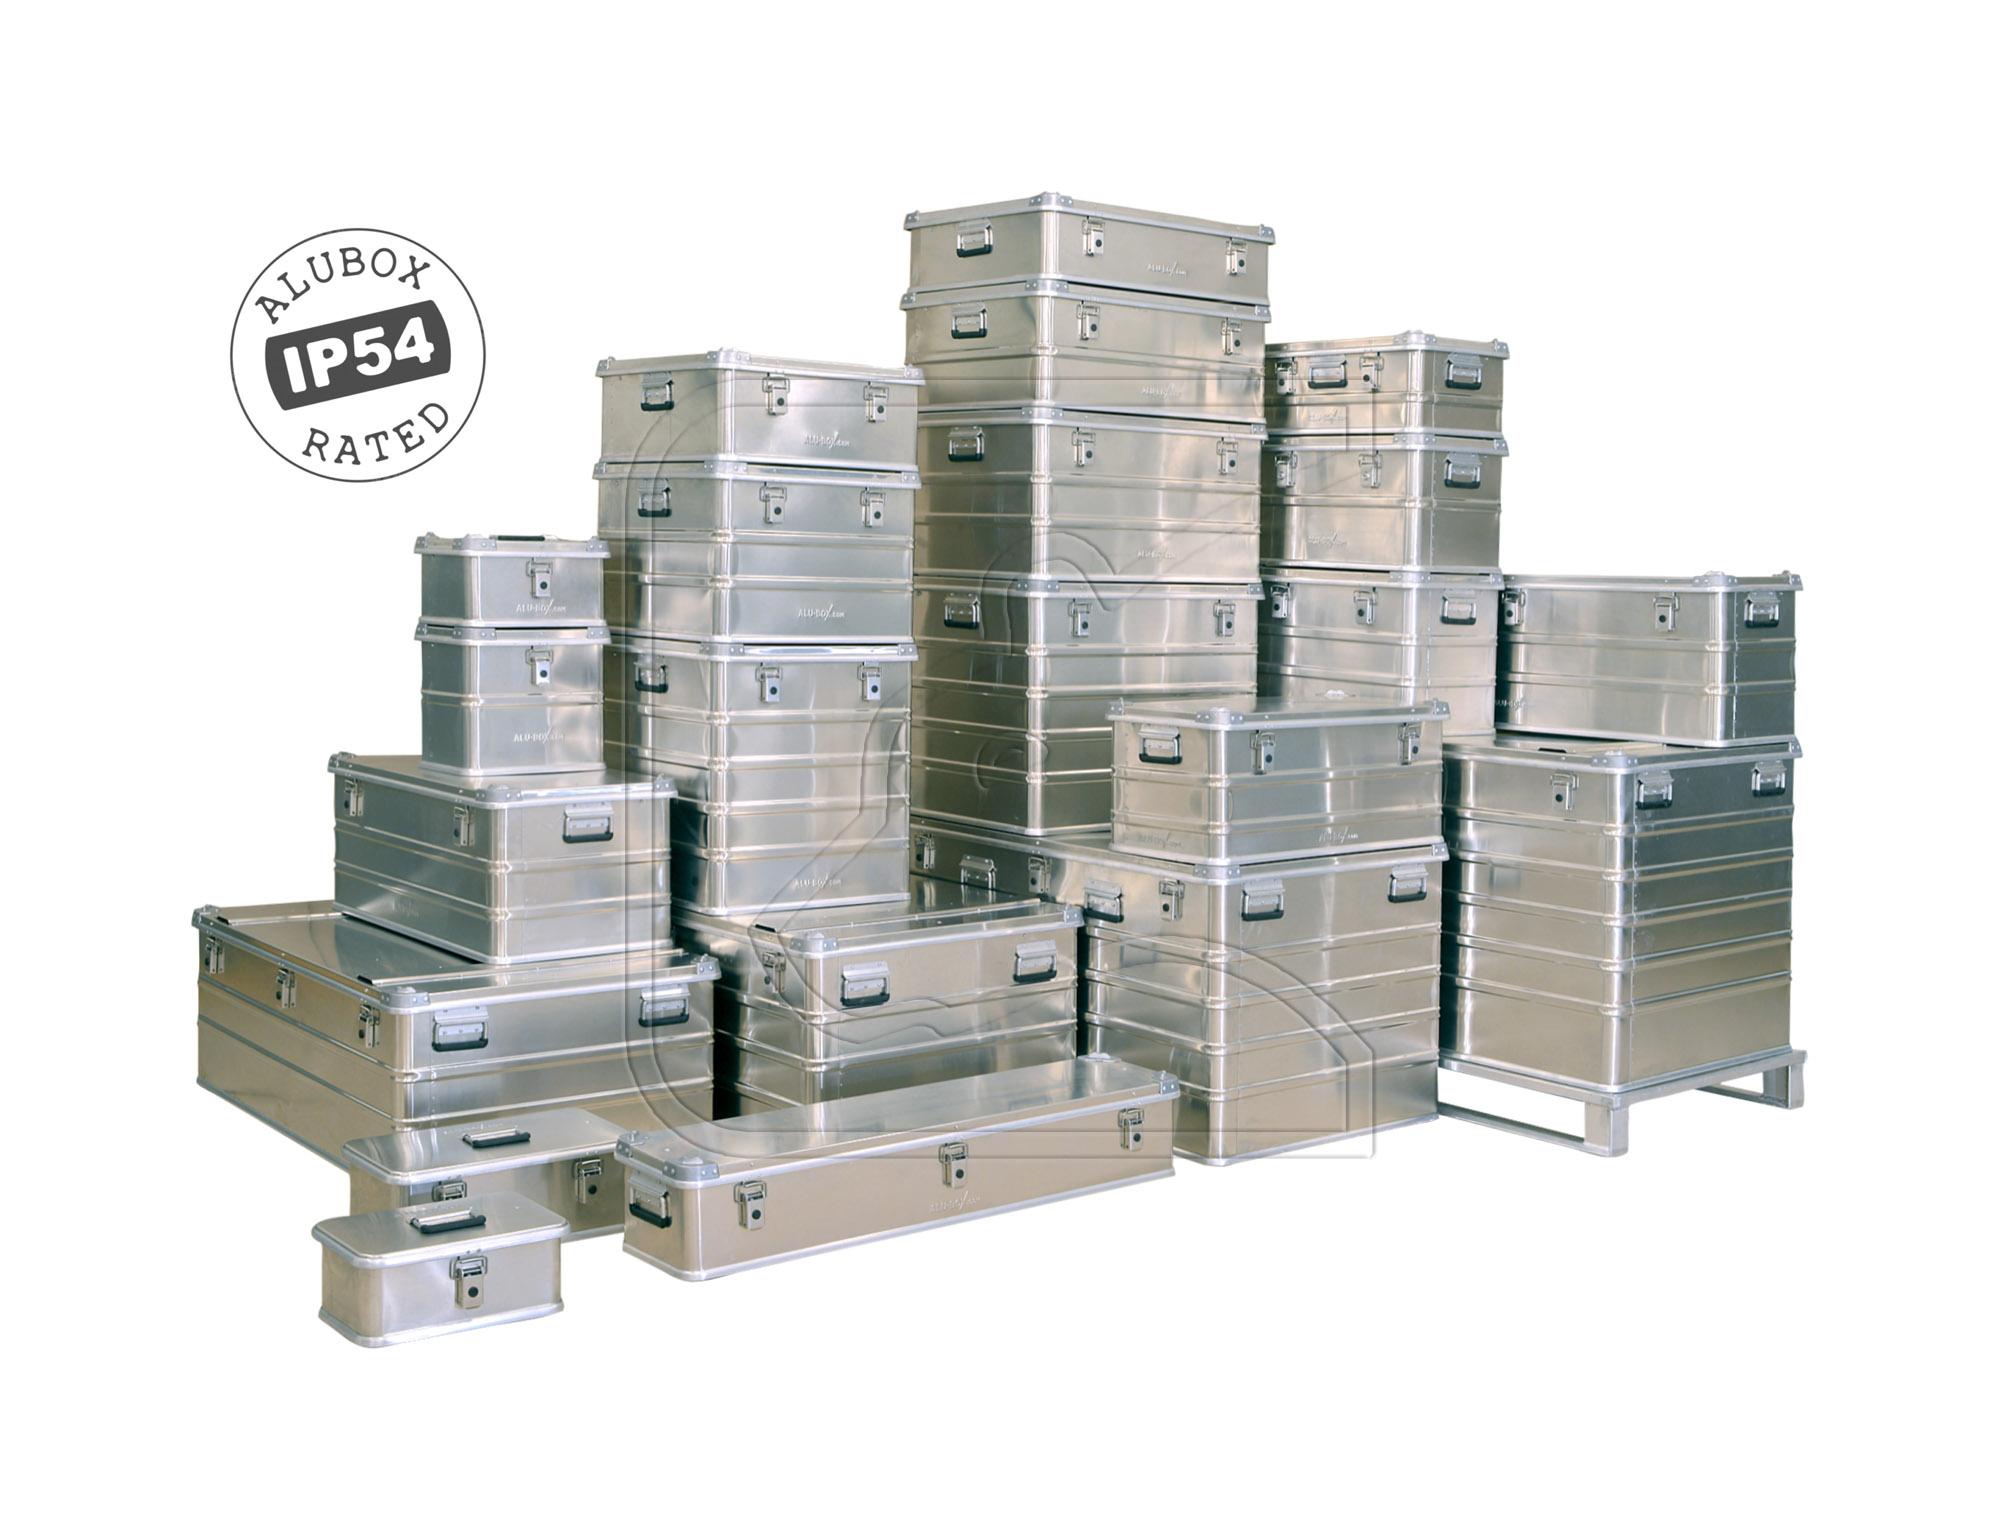 hochwertige aluboxen hier g nstig erh ltlich nakatanenga 4x4 equipment. Black Bedroom Furniture Sets. Home Design Ideas